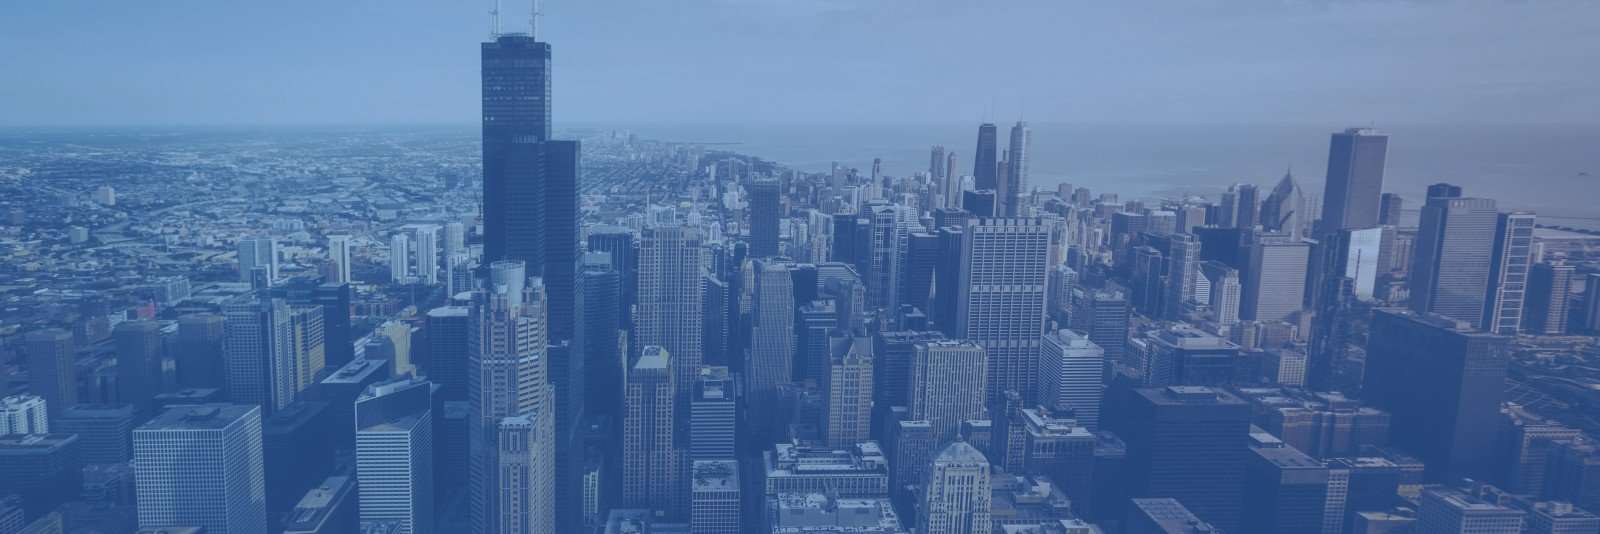 Madison Street Capital advises Innovative Fluid Handling Group (IFH) on its sale to The Mendota Group